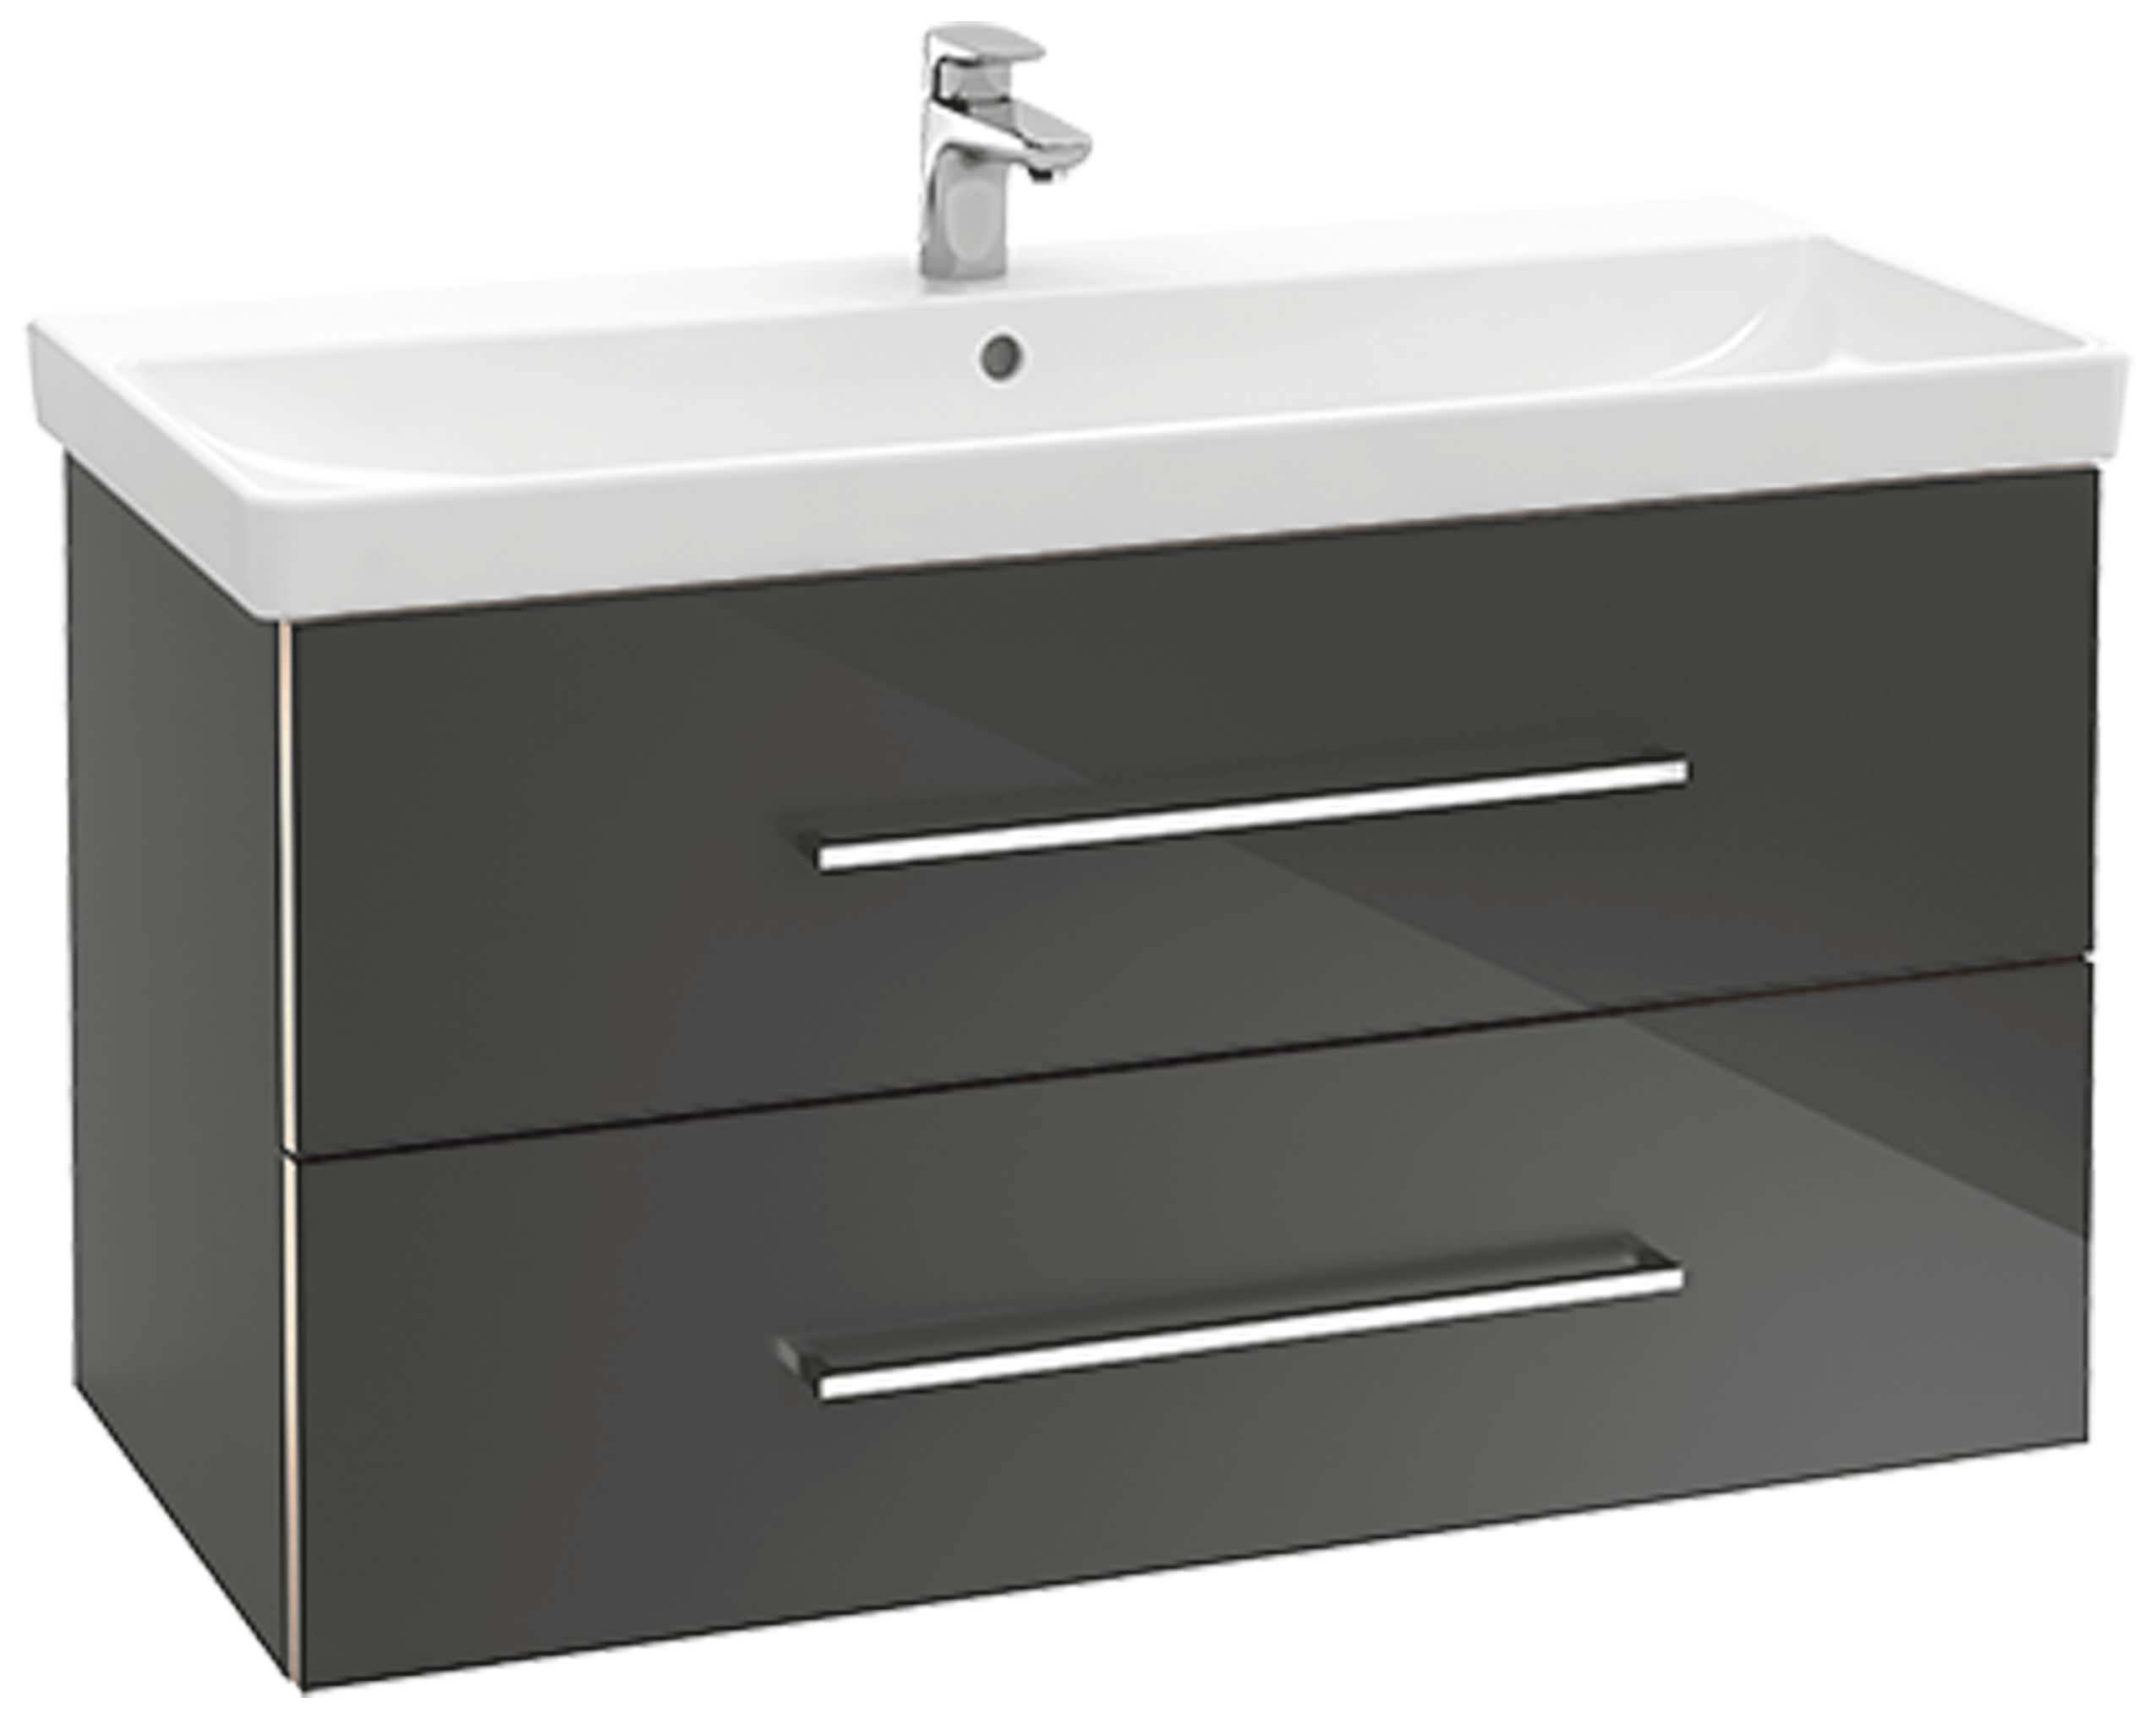 villeroy boch avento waschtischunterschrank 760 x 520 x 447 mm crystal white a89100b4. Black Bedroom Furniture Sets. Home Design Ideas